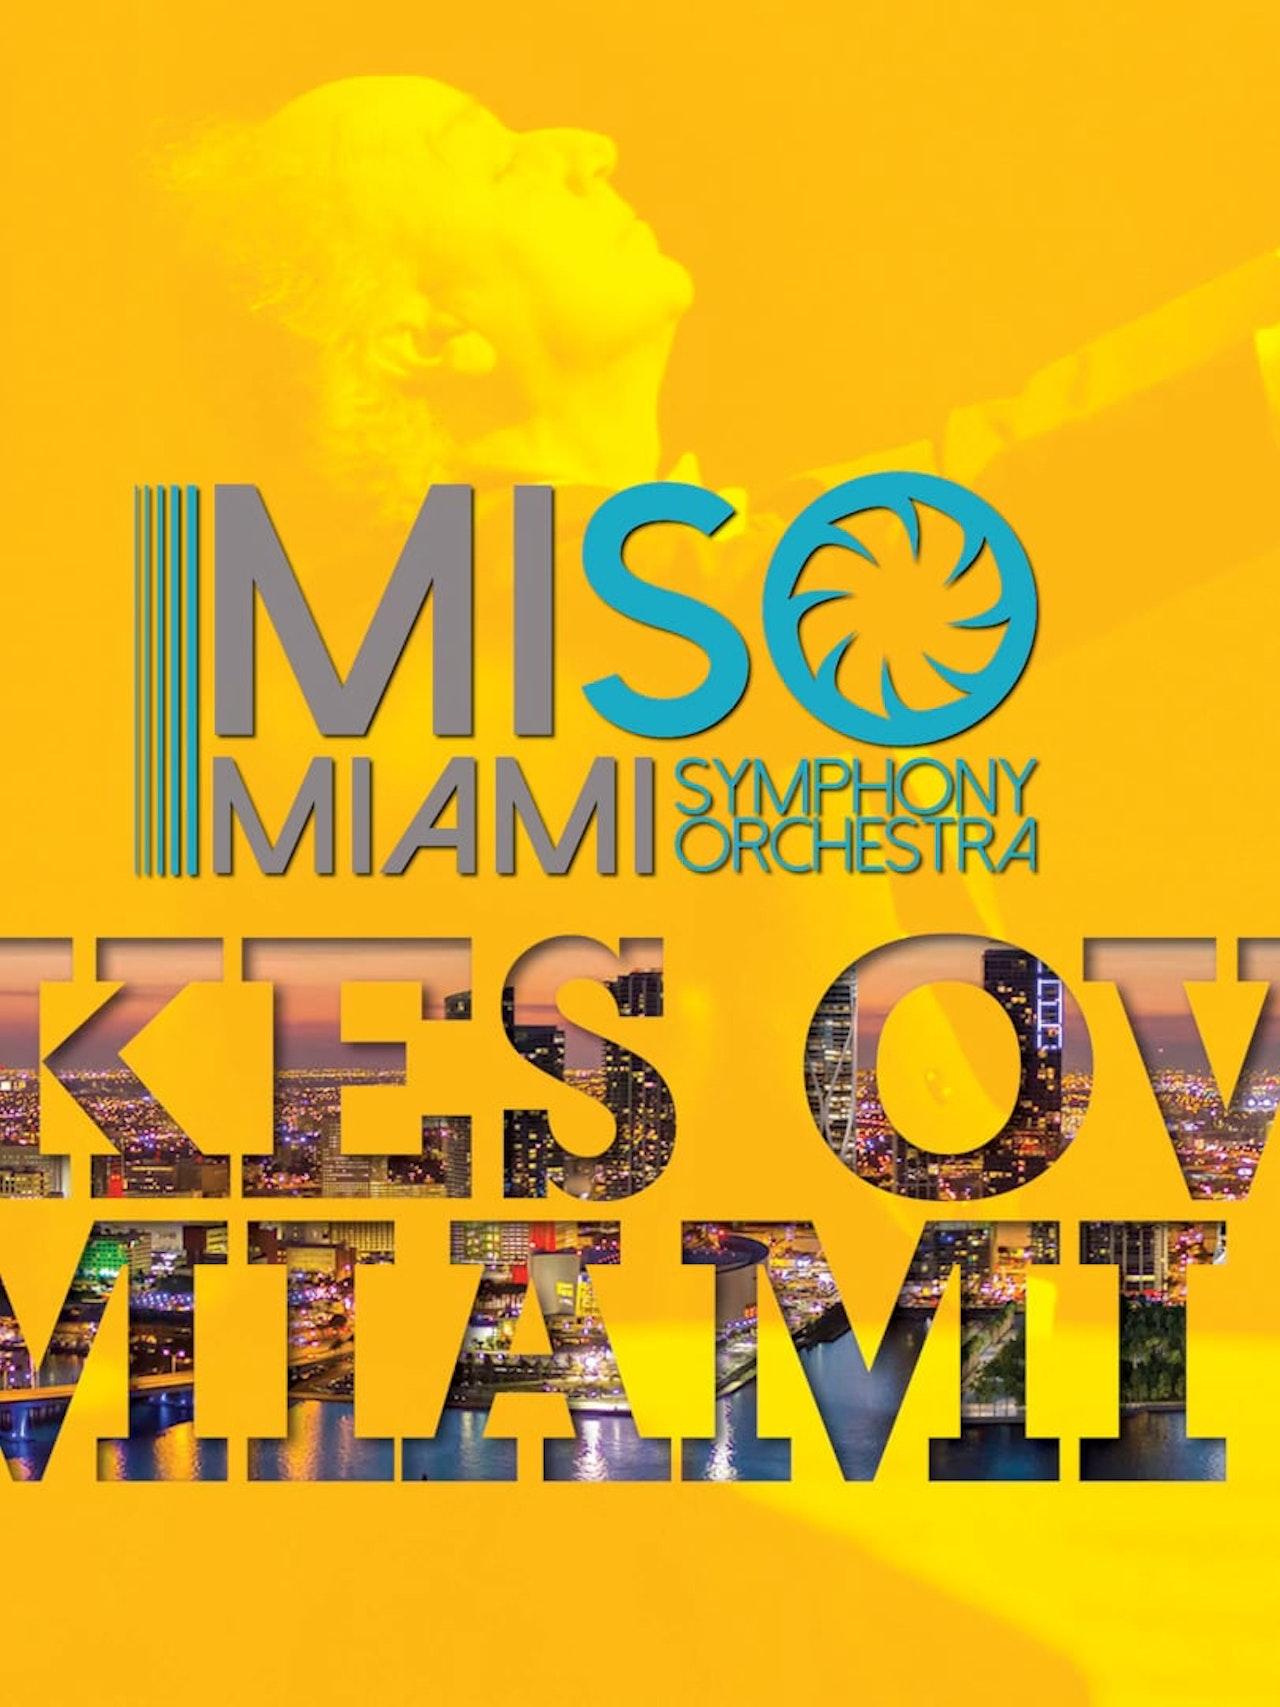 MIAMI SYMPHONY ORCHESTRA PROMO SEASON 2016-17